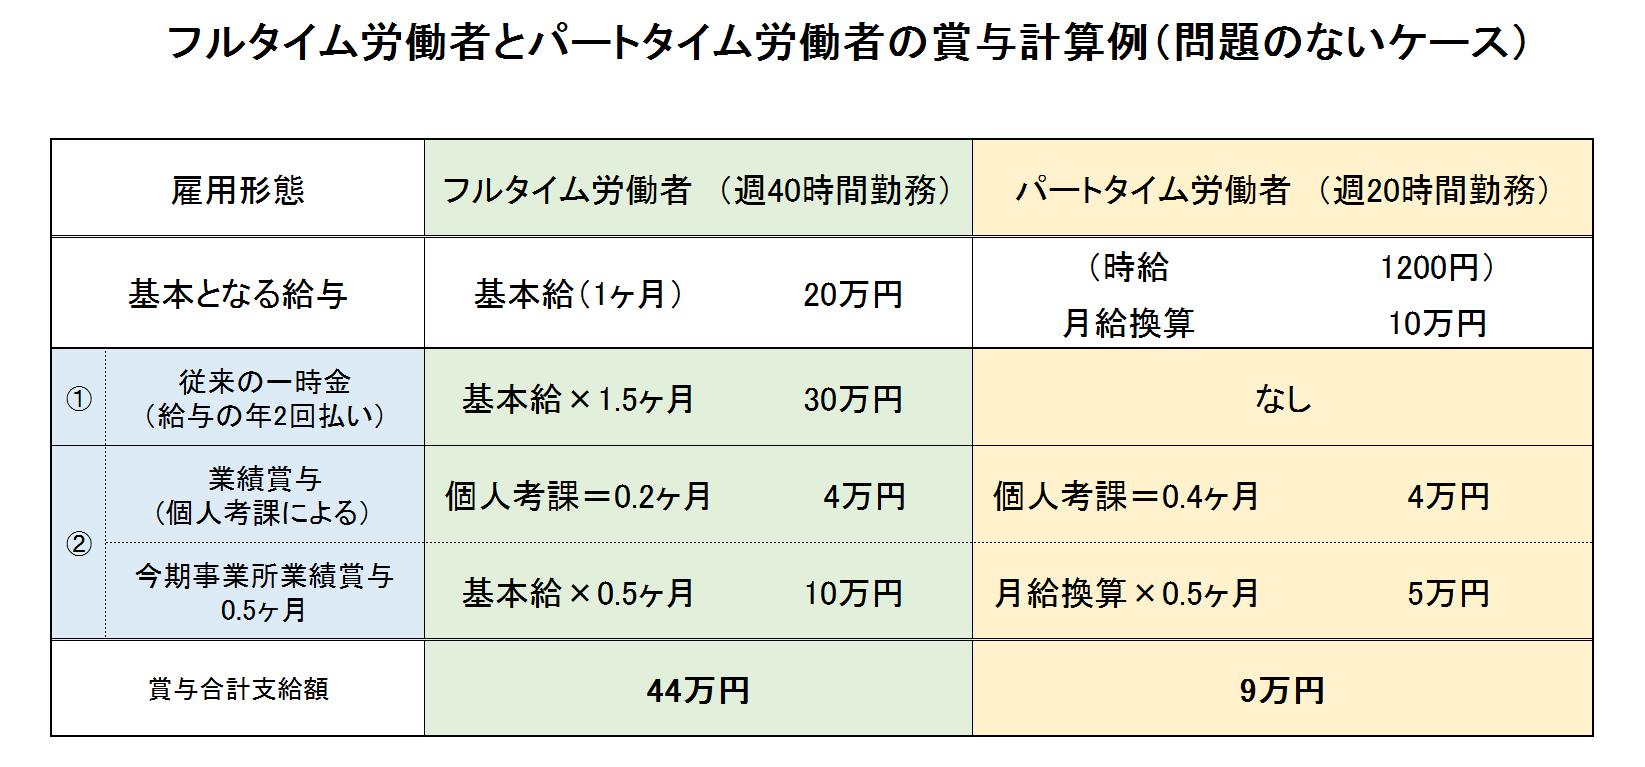 マネセツ166(山本)同一労働同一賃金・手当編/図①